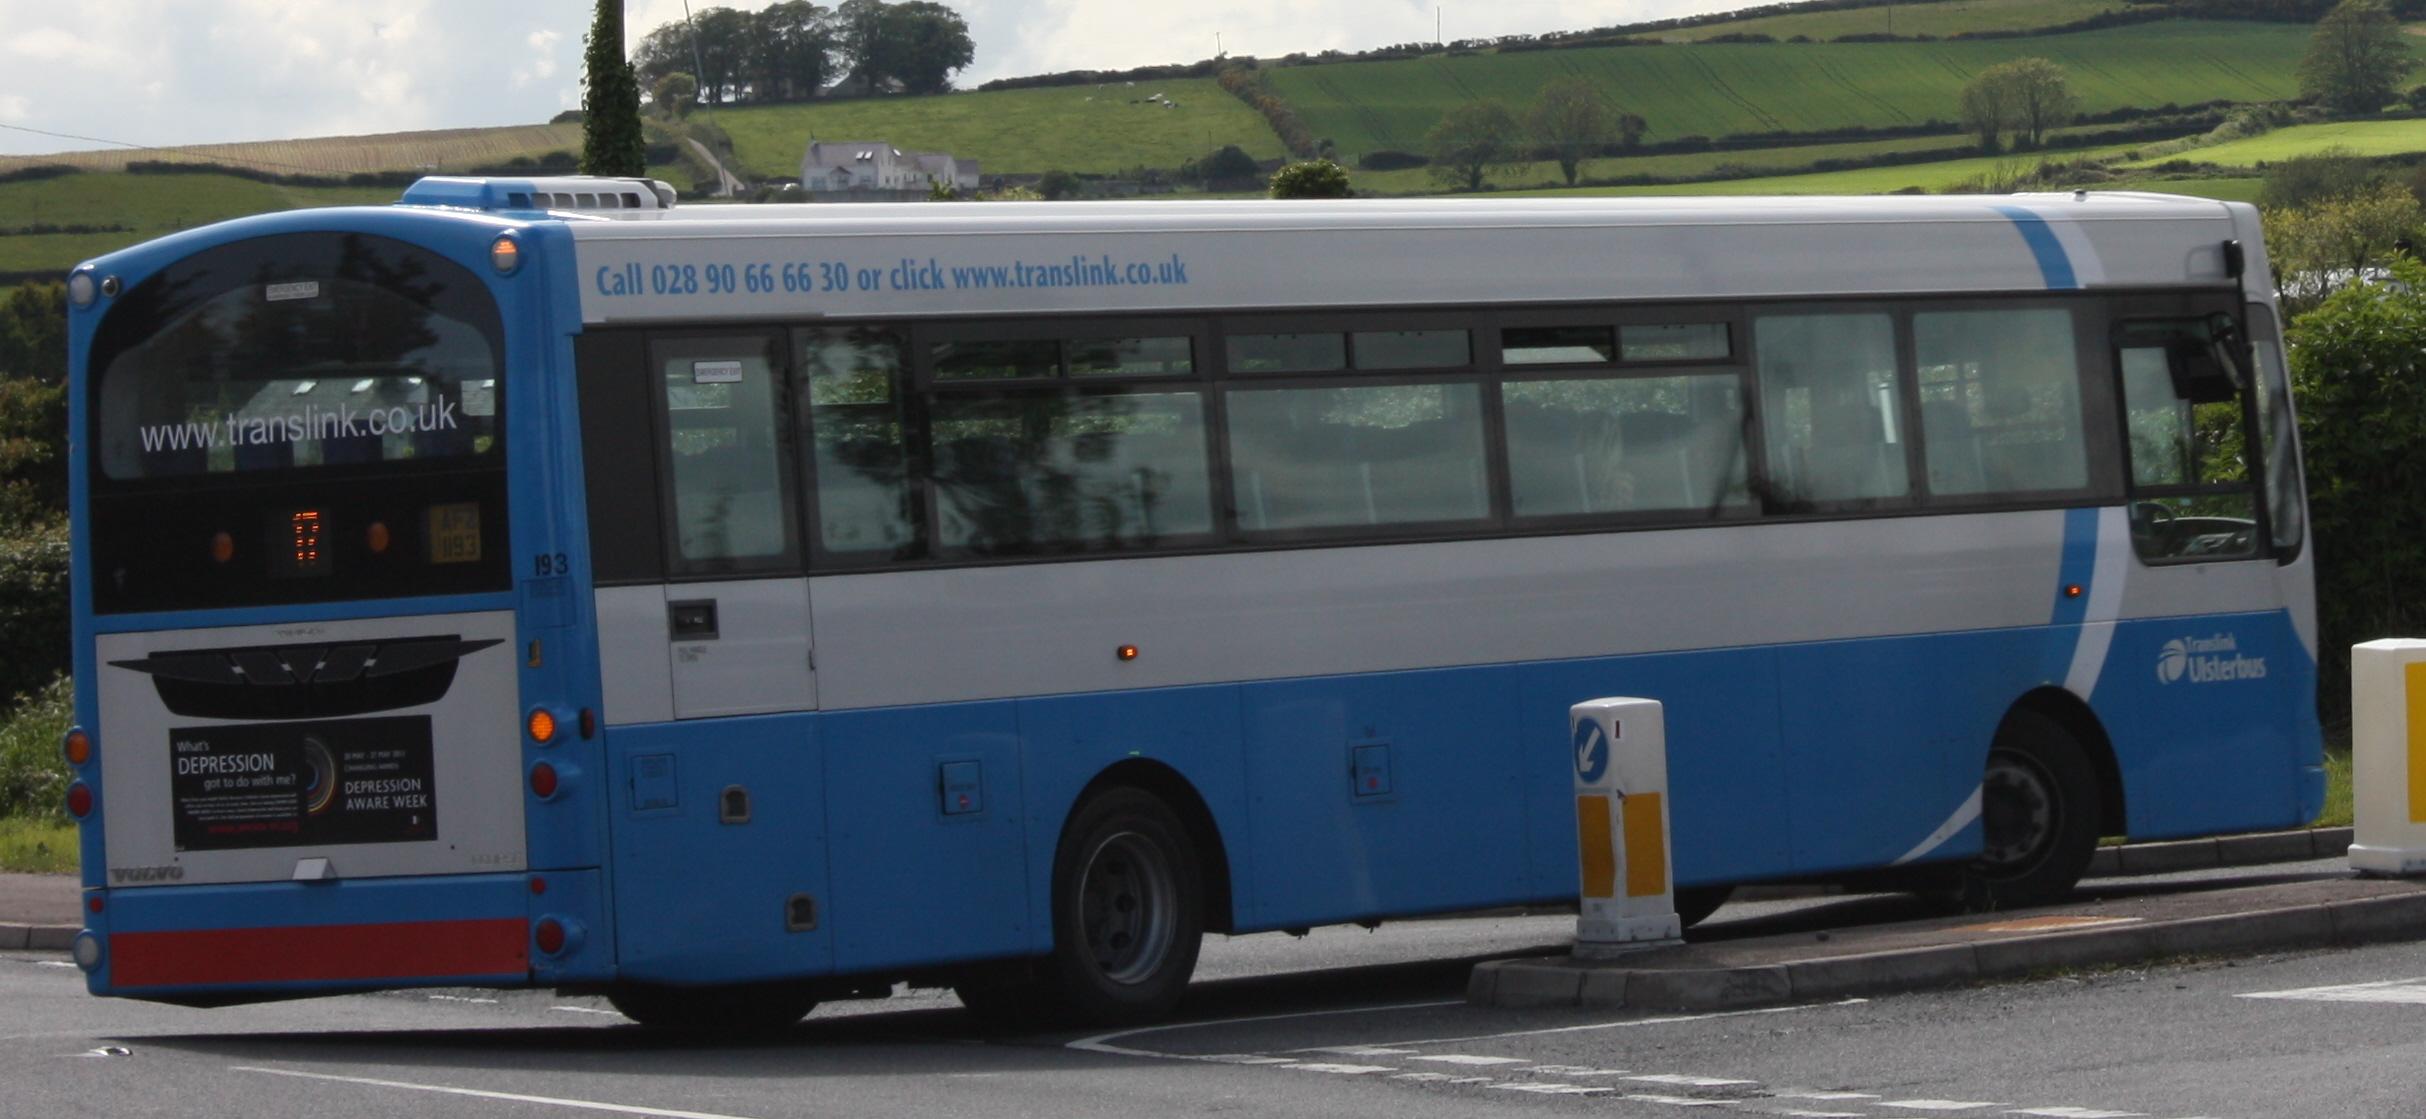 File:Ulsterbus bus 193 (AFZ 1193) 2010 Volvo B7R Wright Eclipse SchoolRun, 31 May 2011.jpg ...